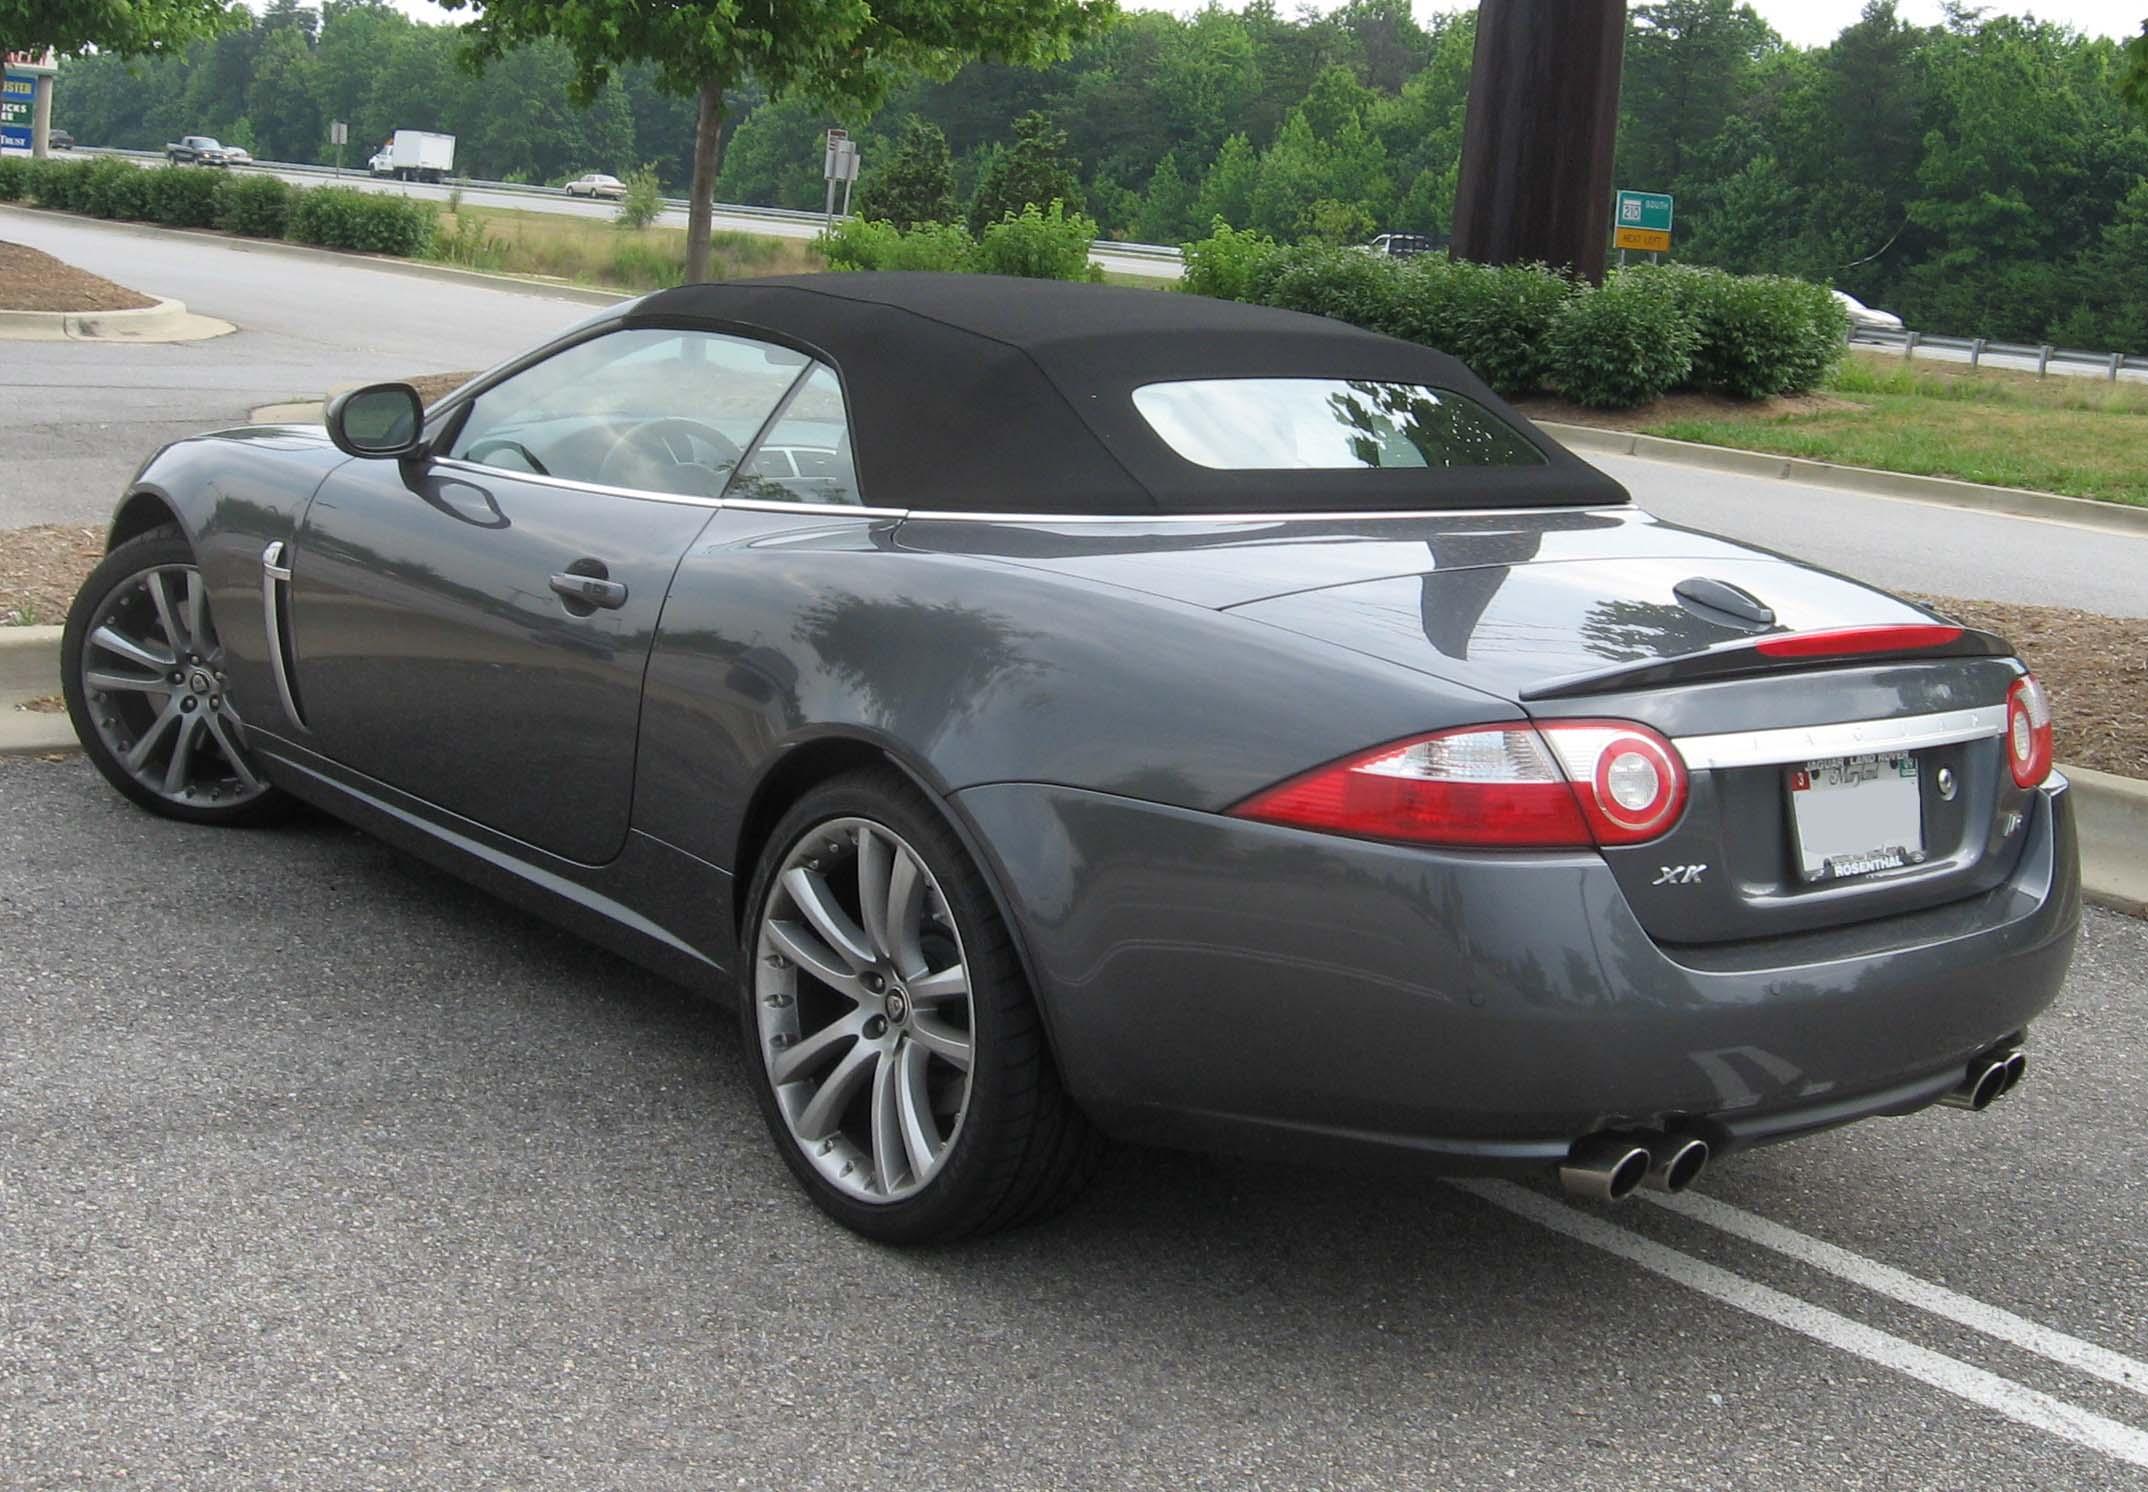 File:2007 Jaguar XKR Convertible Rear